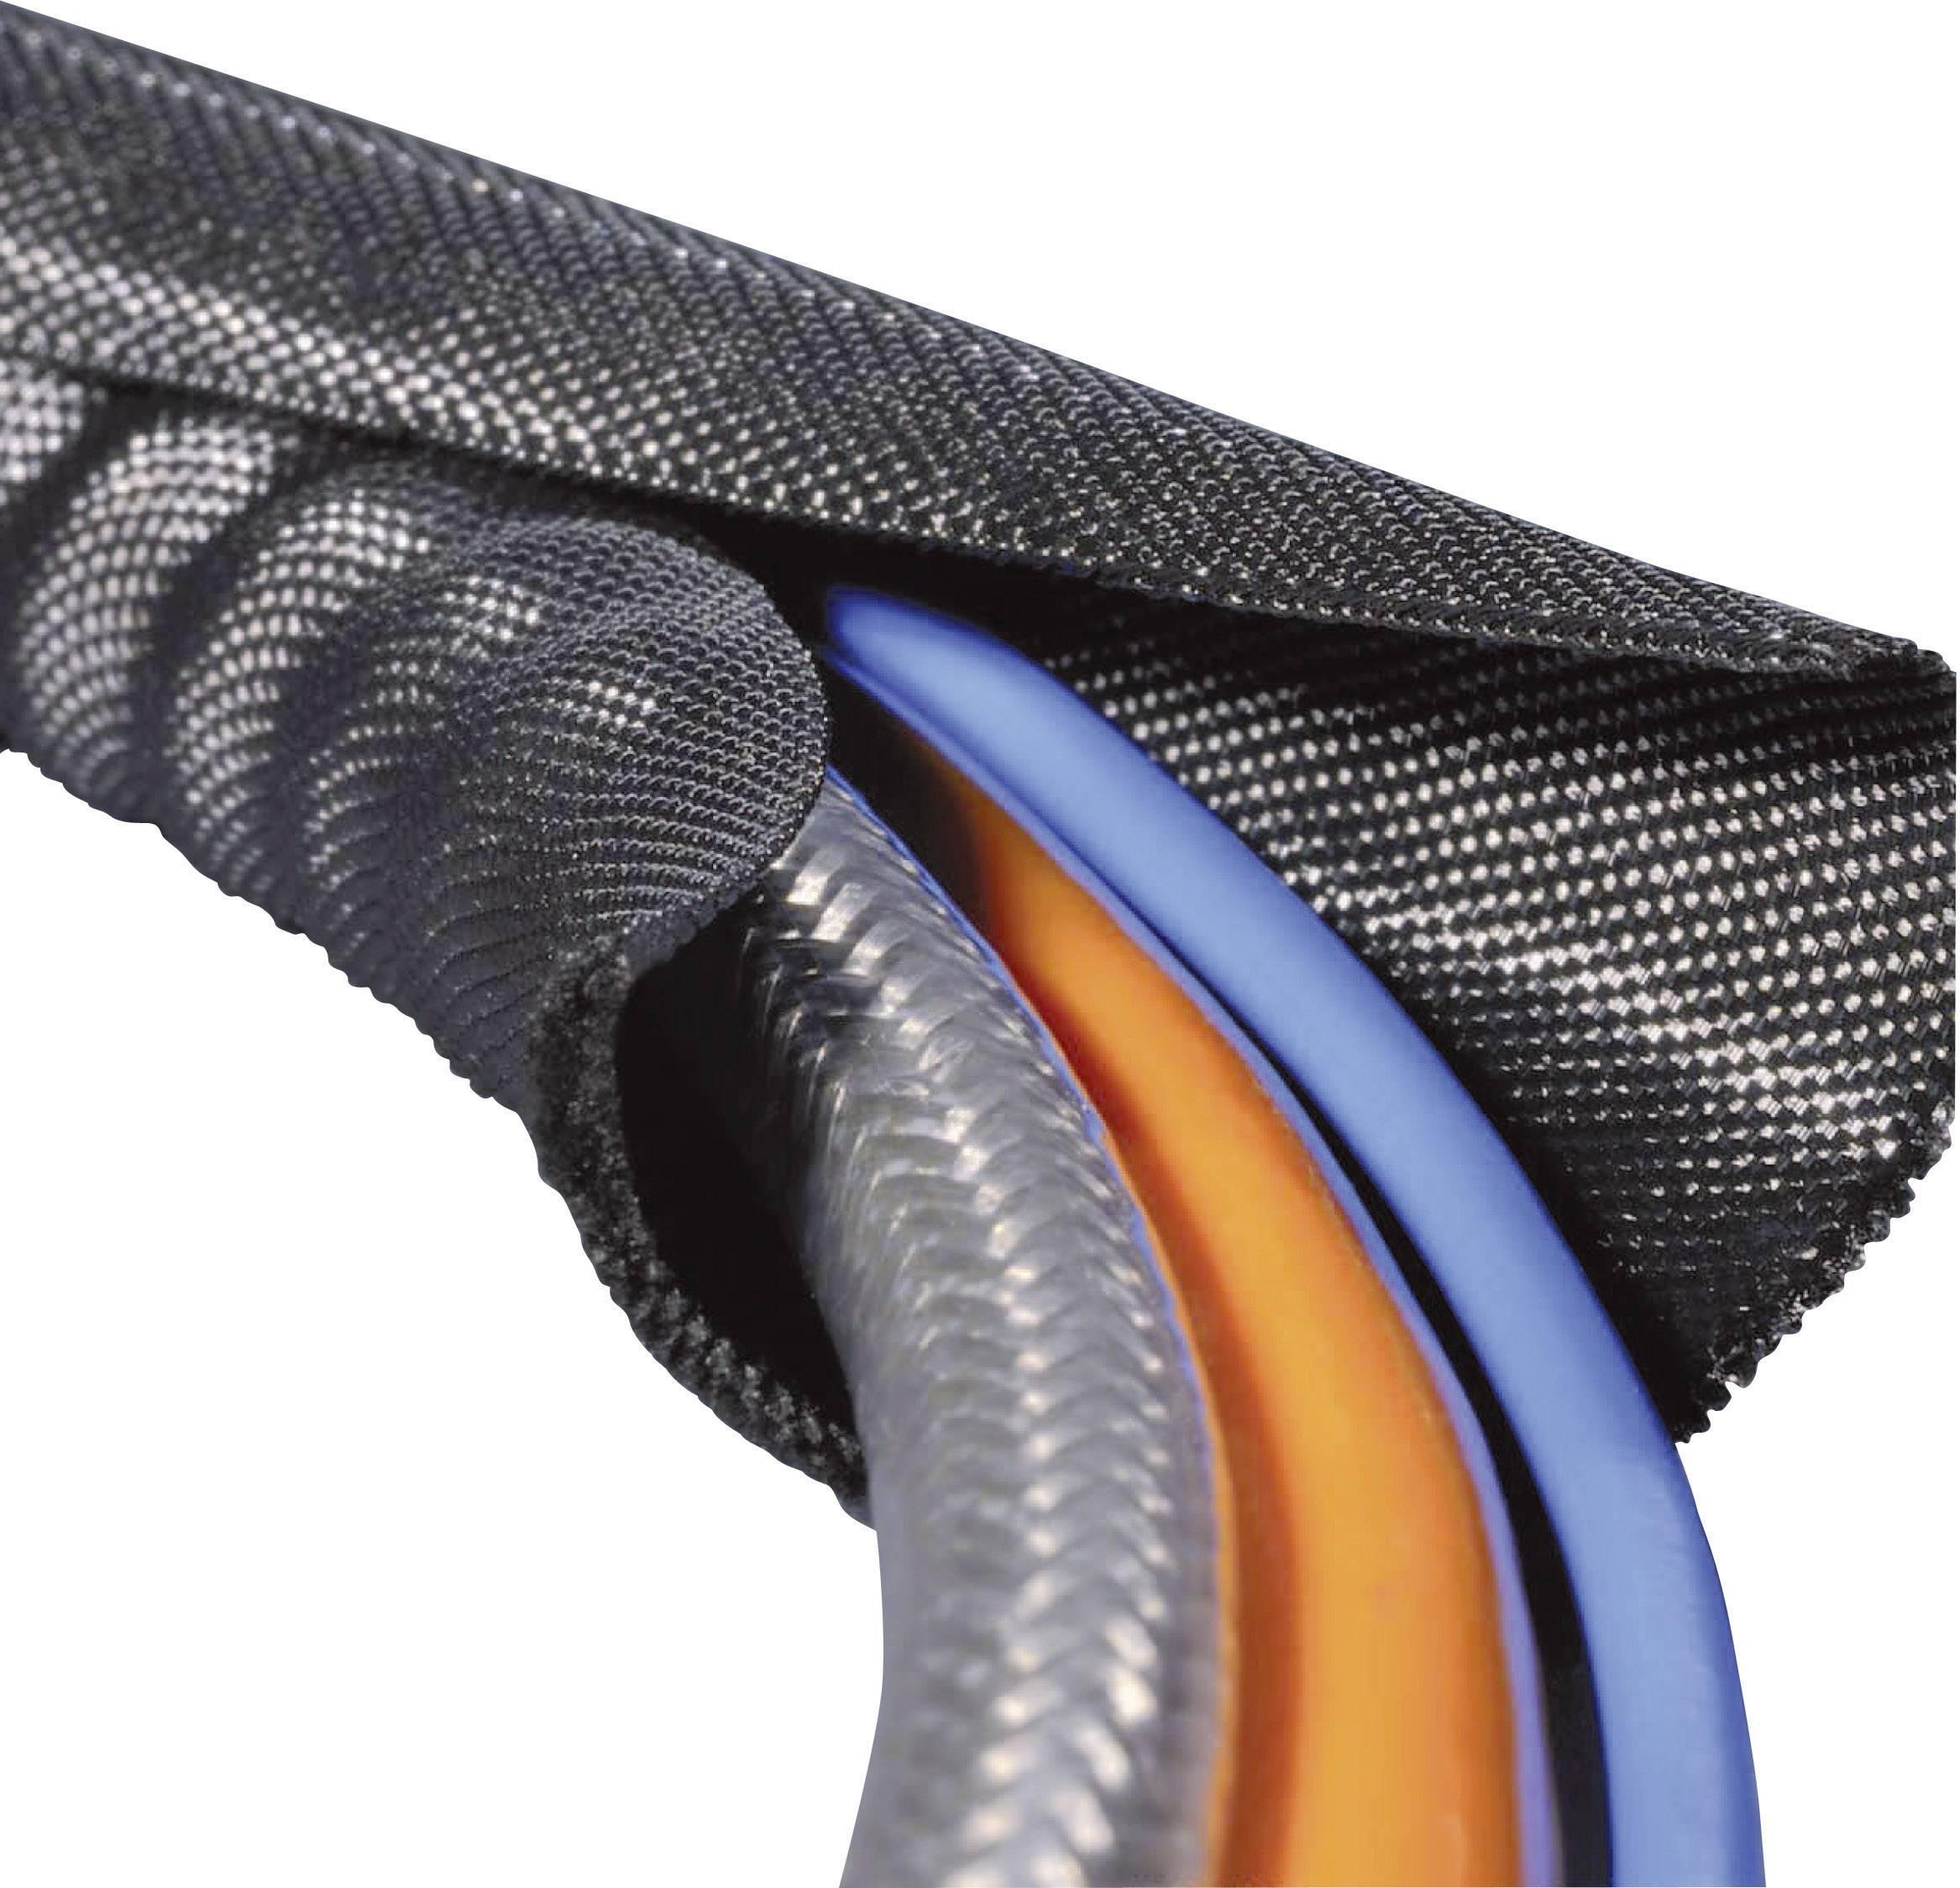 Ochranný oplet HellermannTyton Twist-In 19, 16 do 19 mm, -70 do +125 °C, metrový tovar, čierna